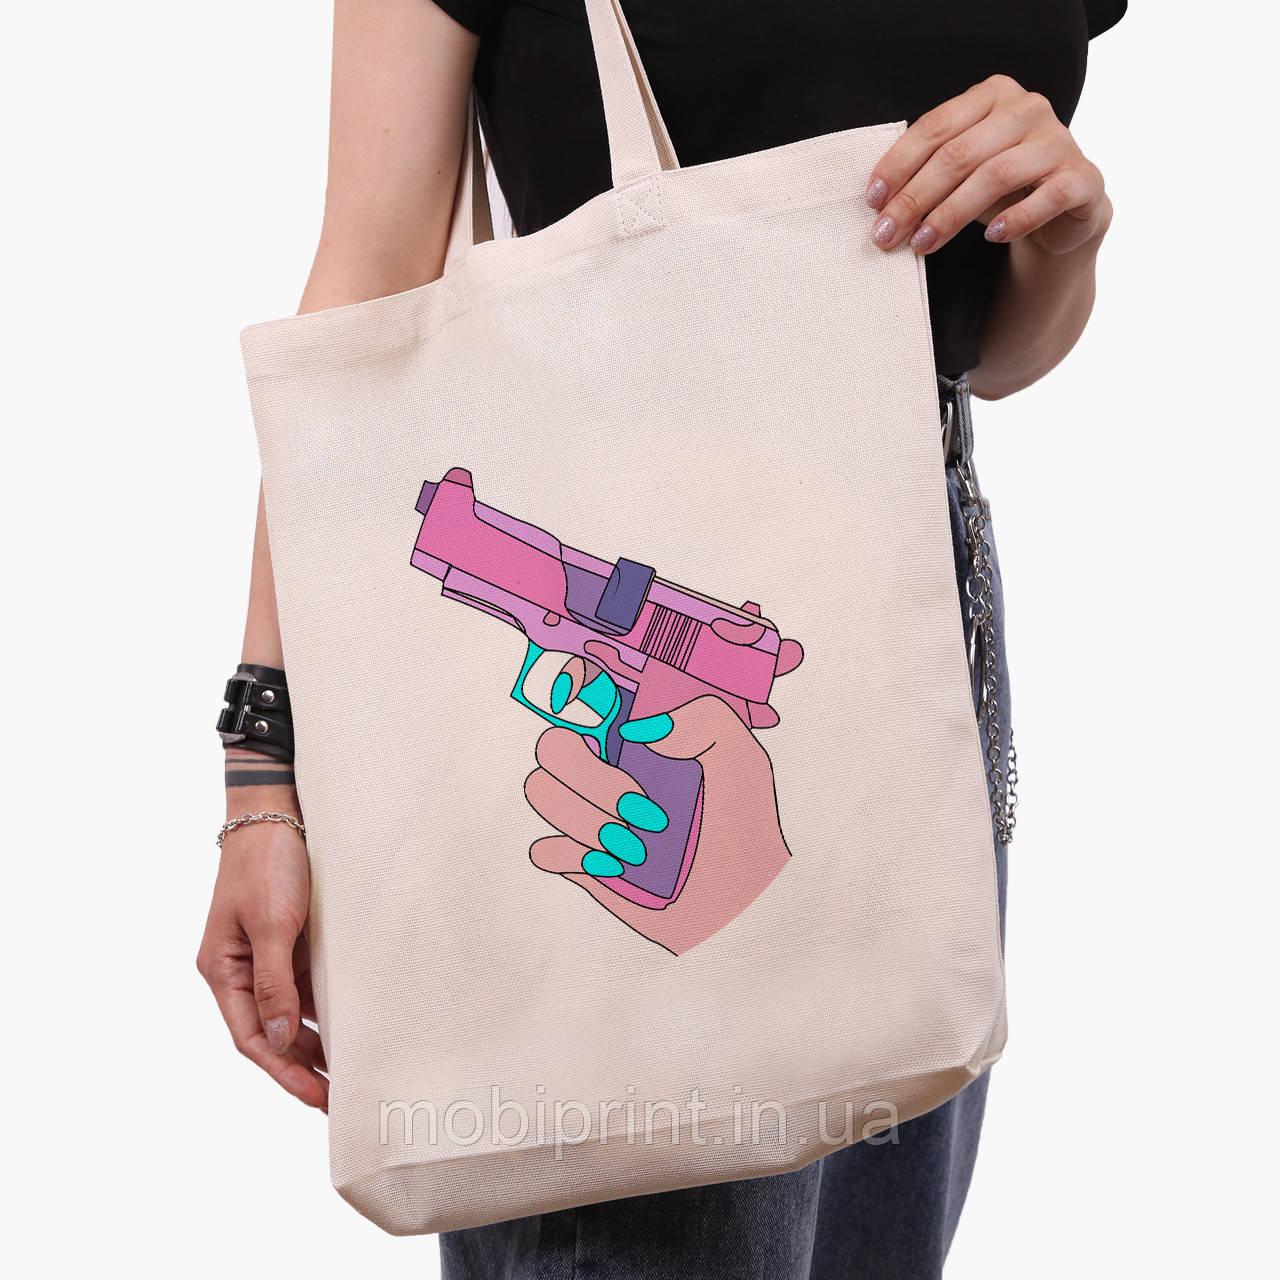 Эко сумка шоппер белая Убивство Диджитал Арт (Kill Digital art) (9227-1636-1)  экосумка шопер 41*39*8 см